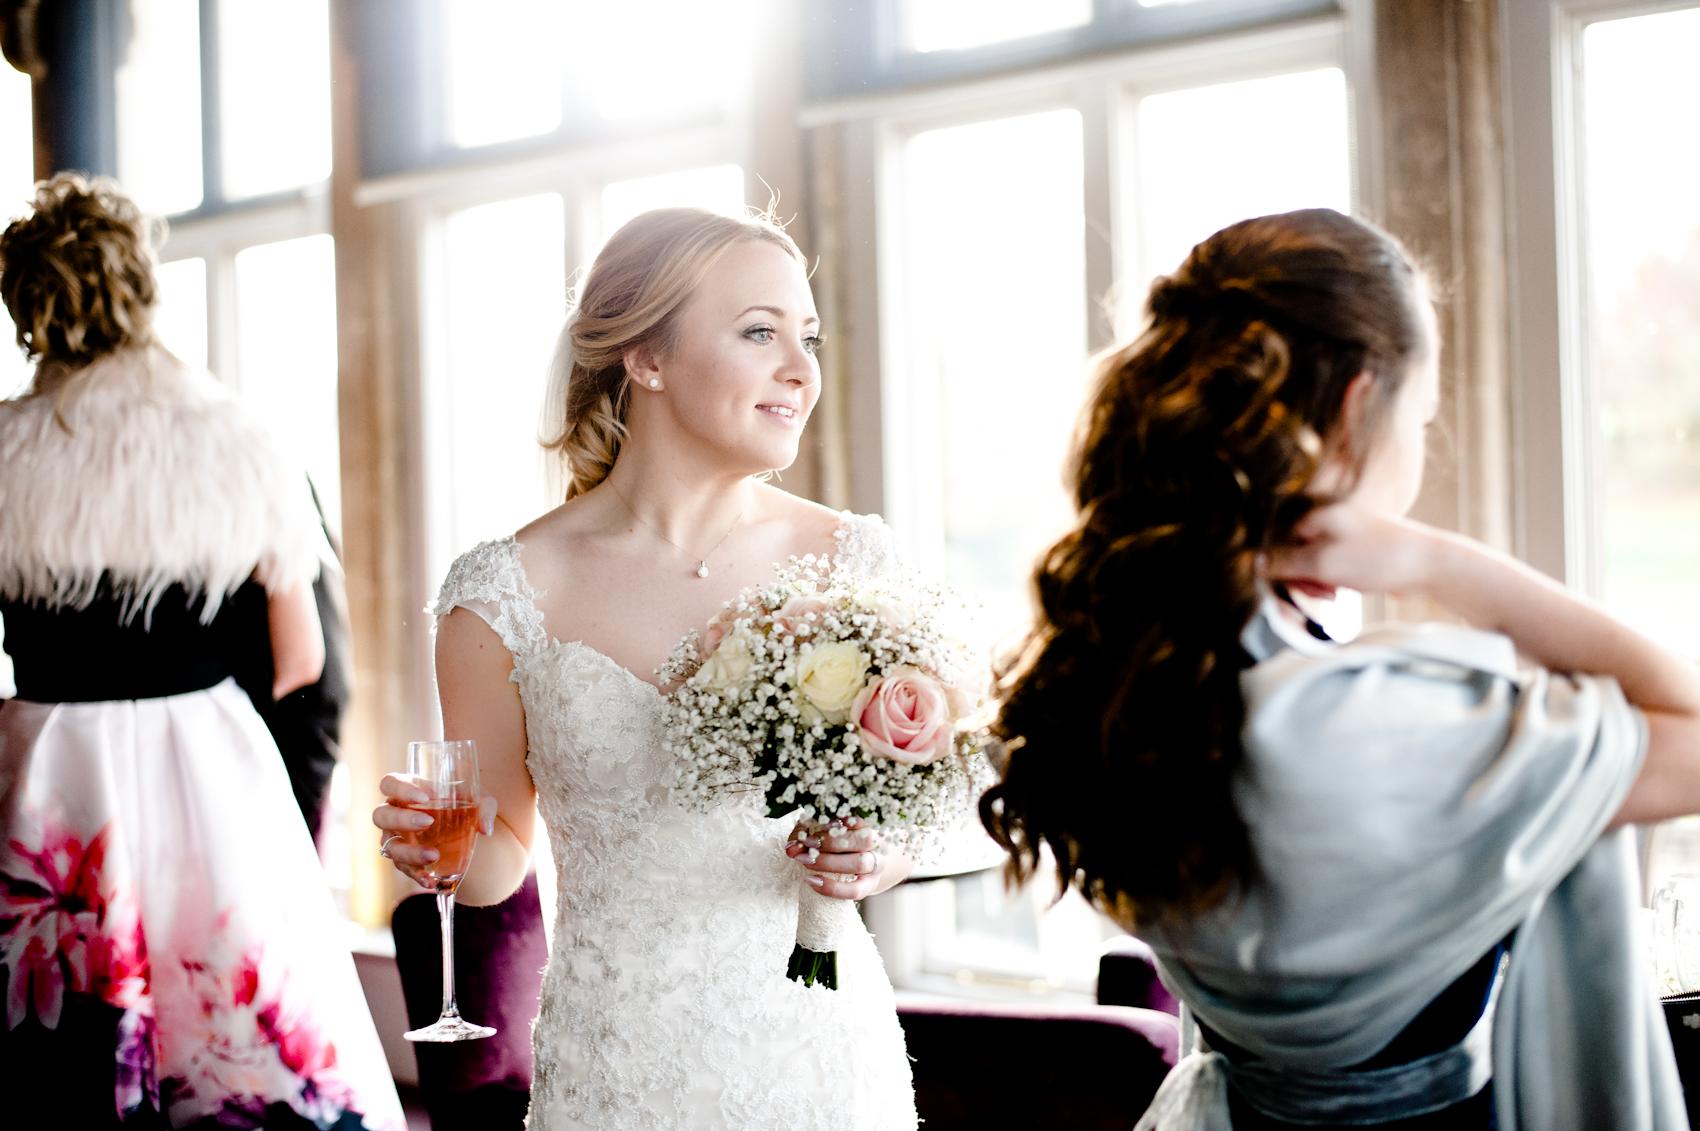 Declan & Emma wedding (18 of 29).jpg